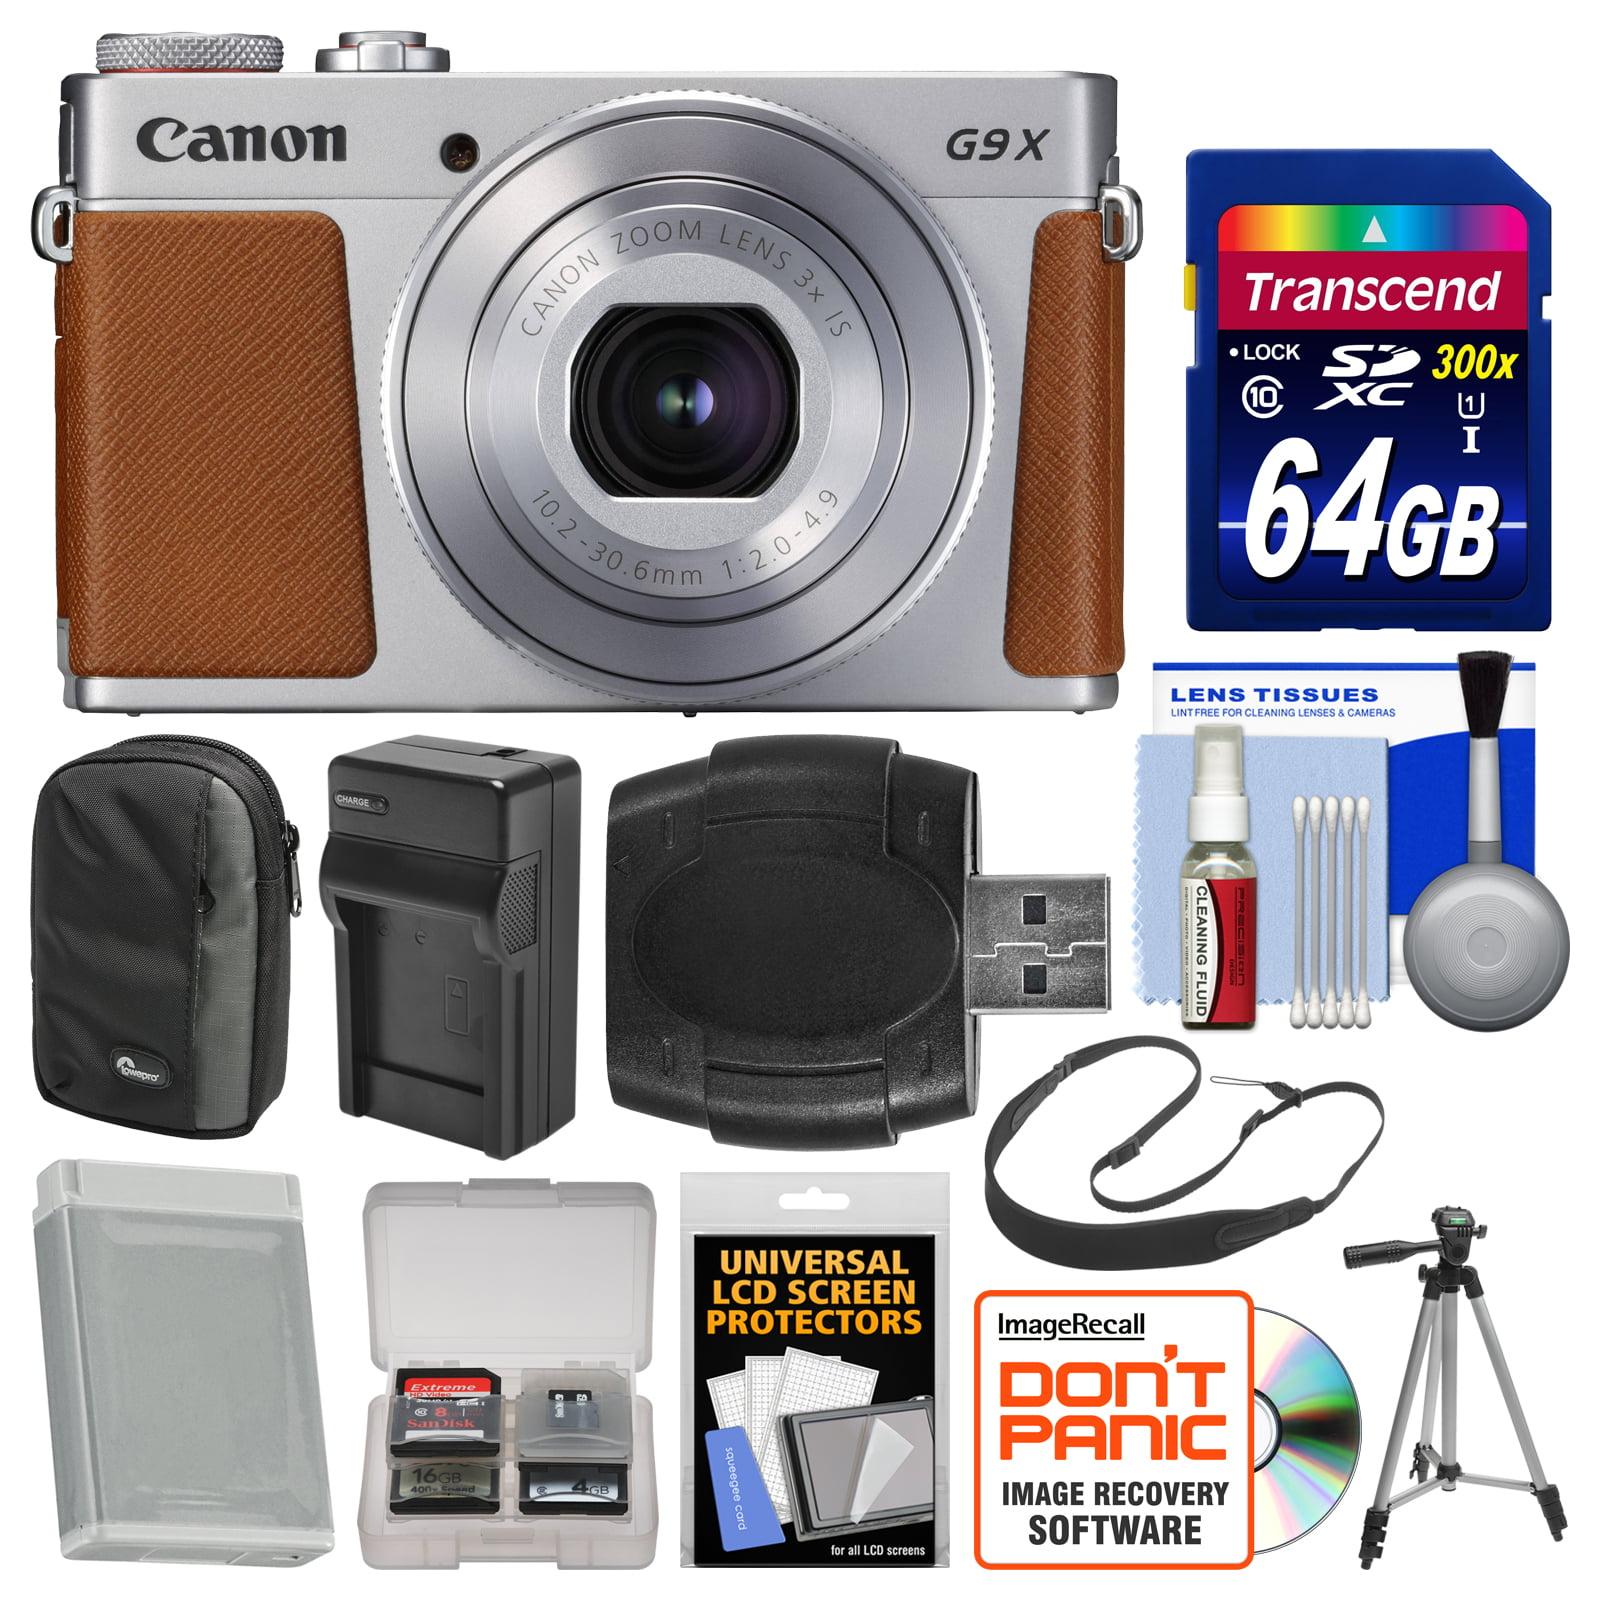 Canon PowerShot G9 X Mark II Wi-Fi Digital Camera (Silver) with 64GB...